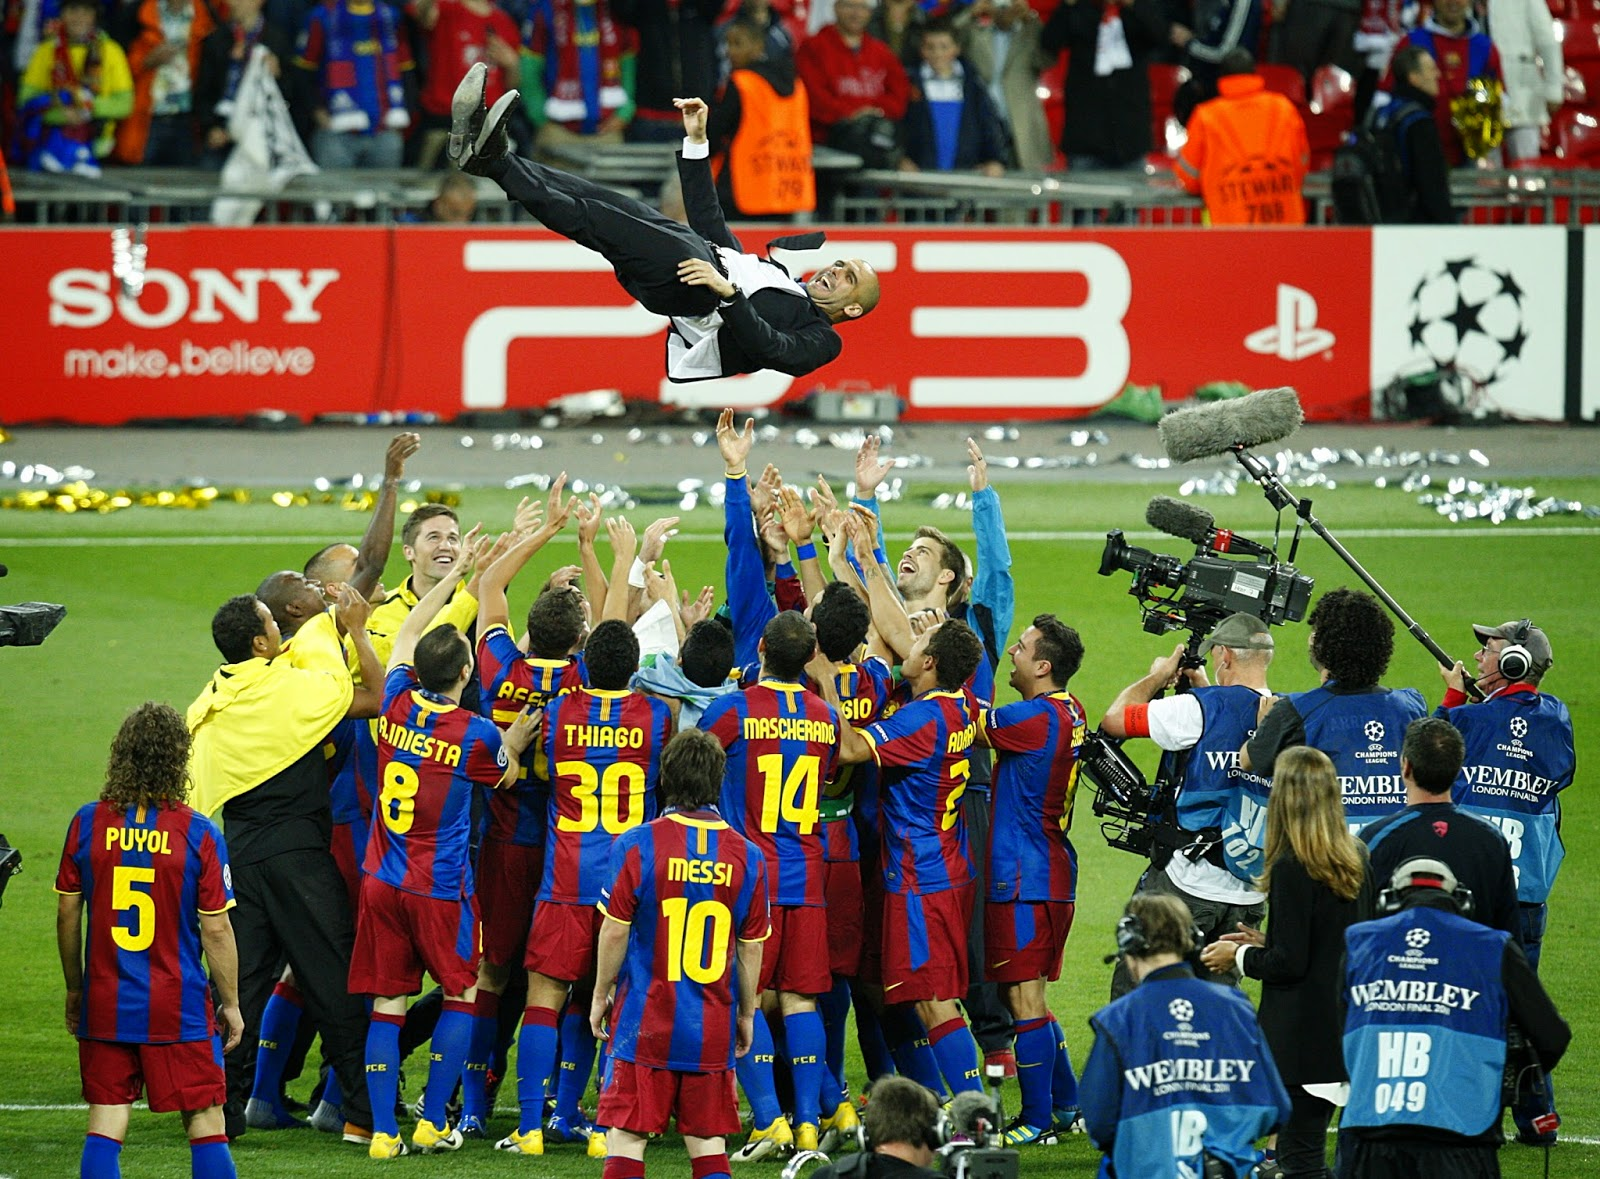 2011 Champions League Final - Barcelona v Manchester United